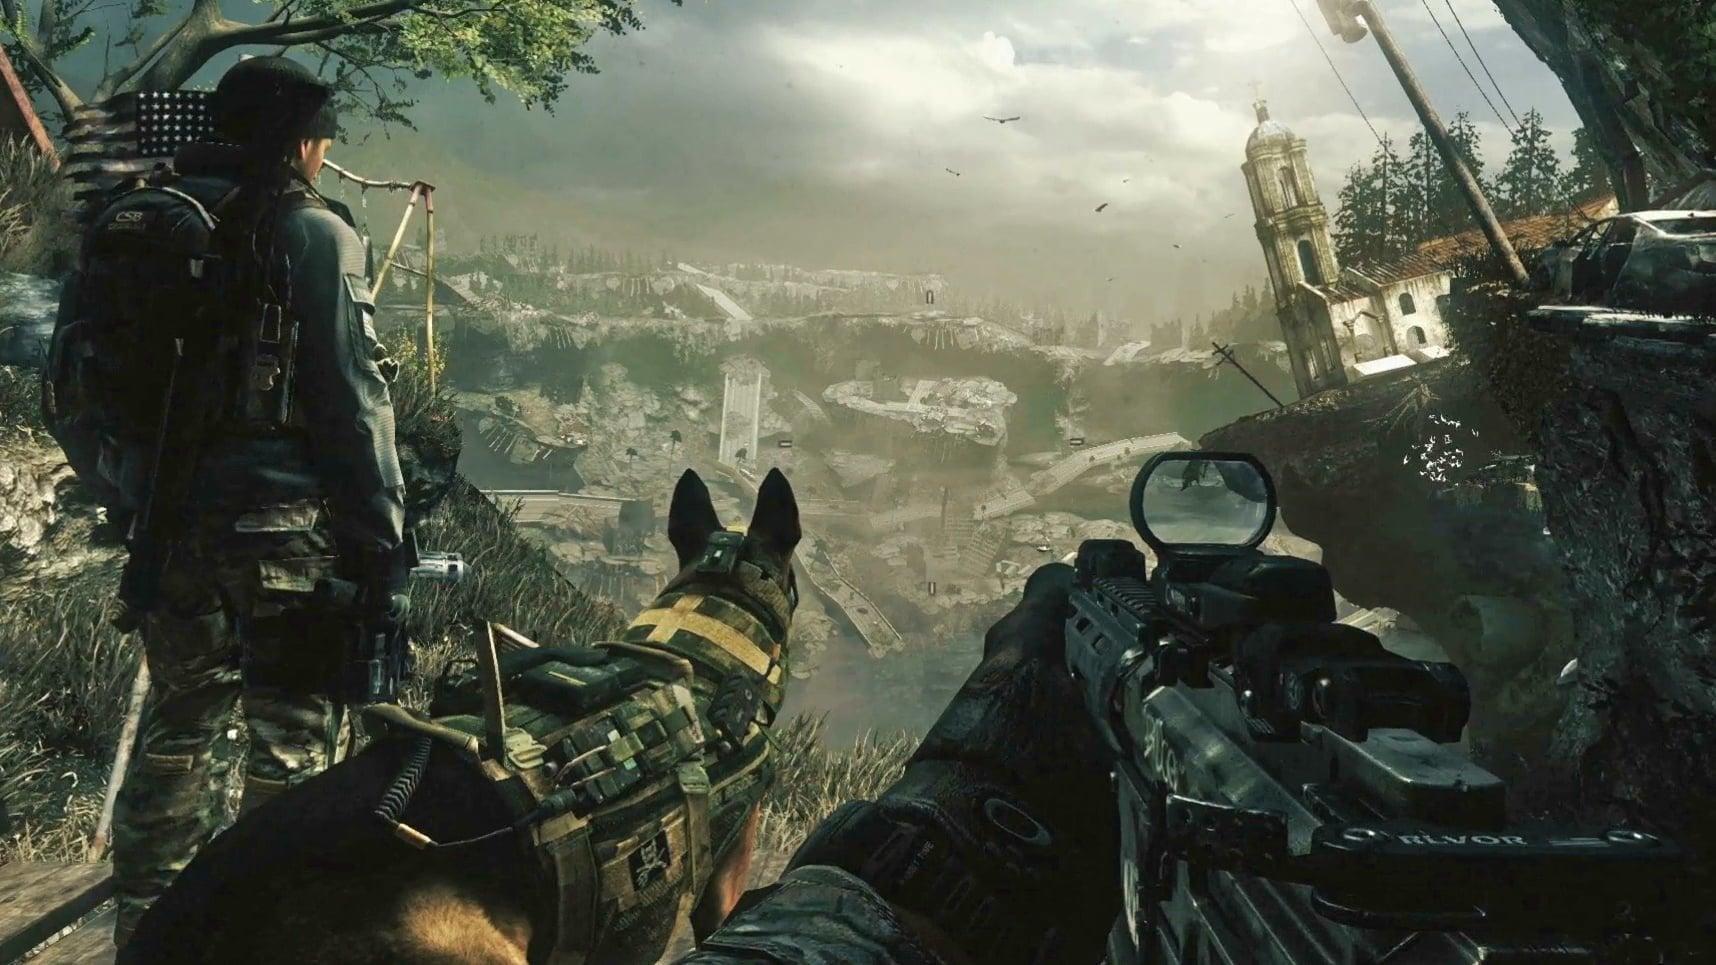 Call of Duty: Ghosts Preview 1 techboys.de • smarte News, auf den Punkt! Call of Duty: Ghosts Preview